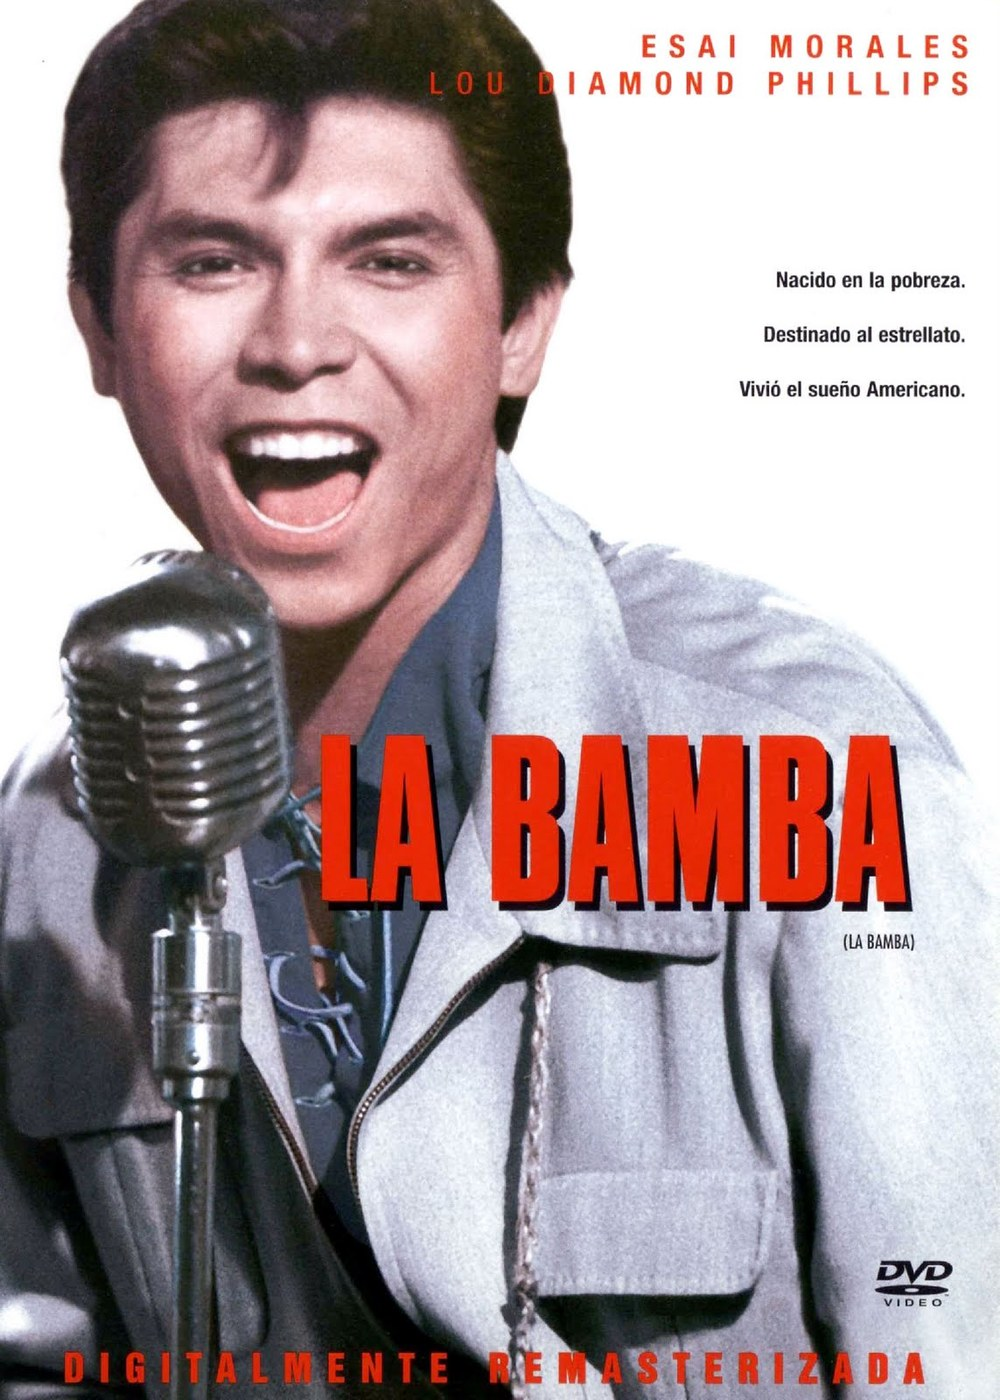 La bamba –  Luis Valdez